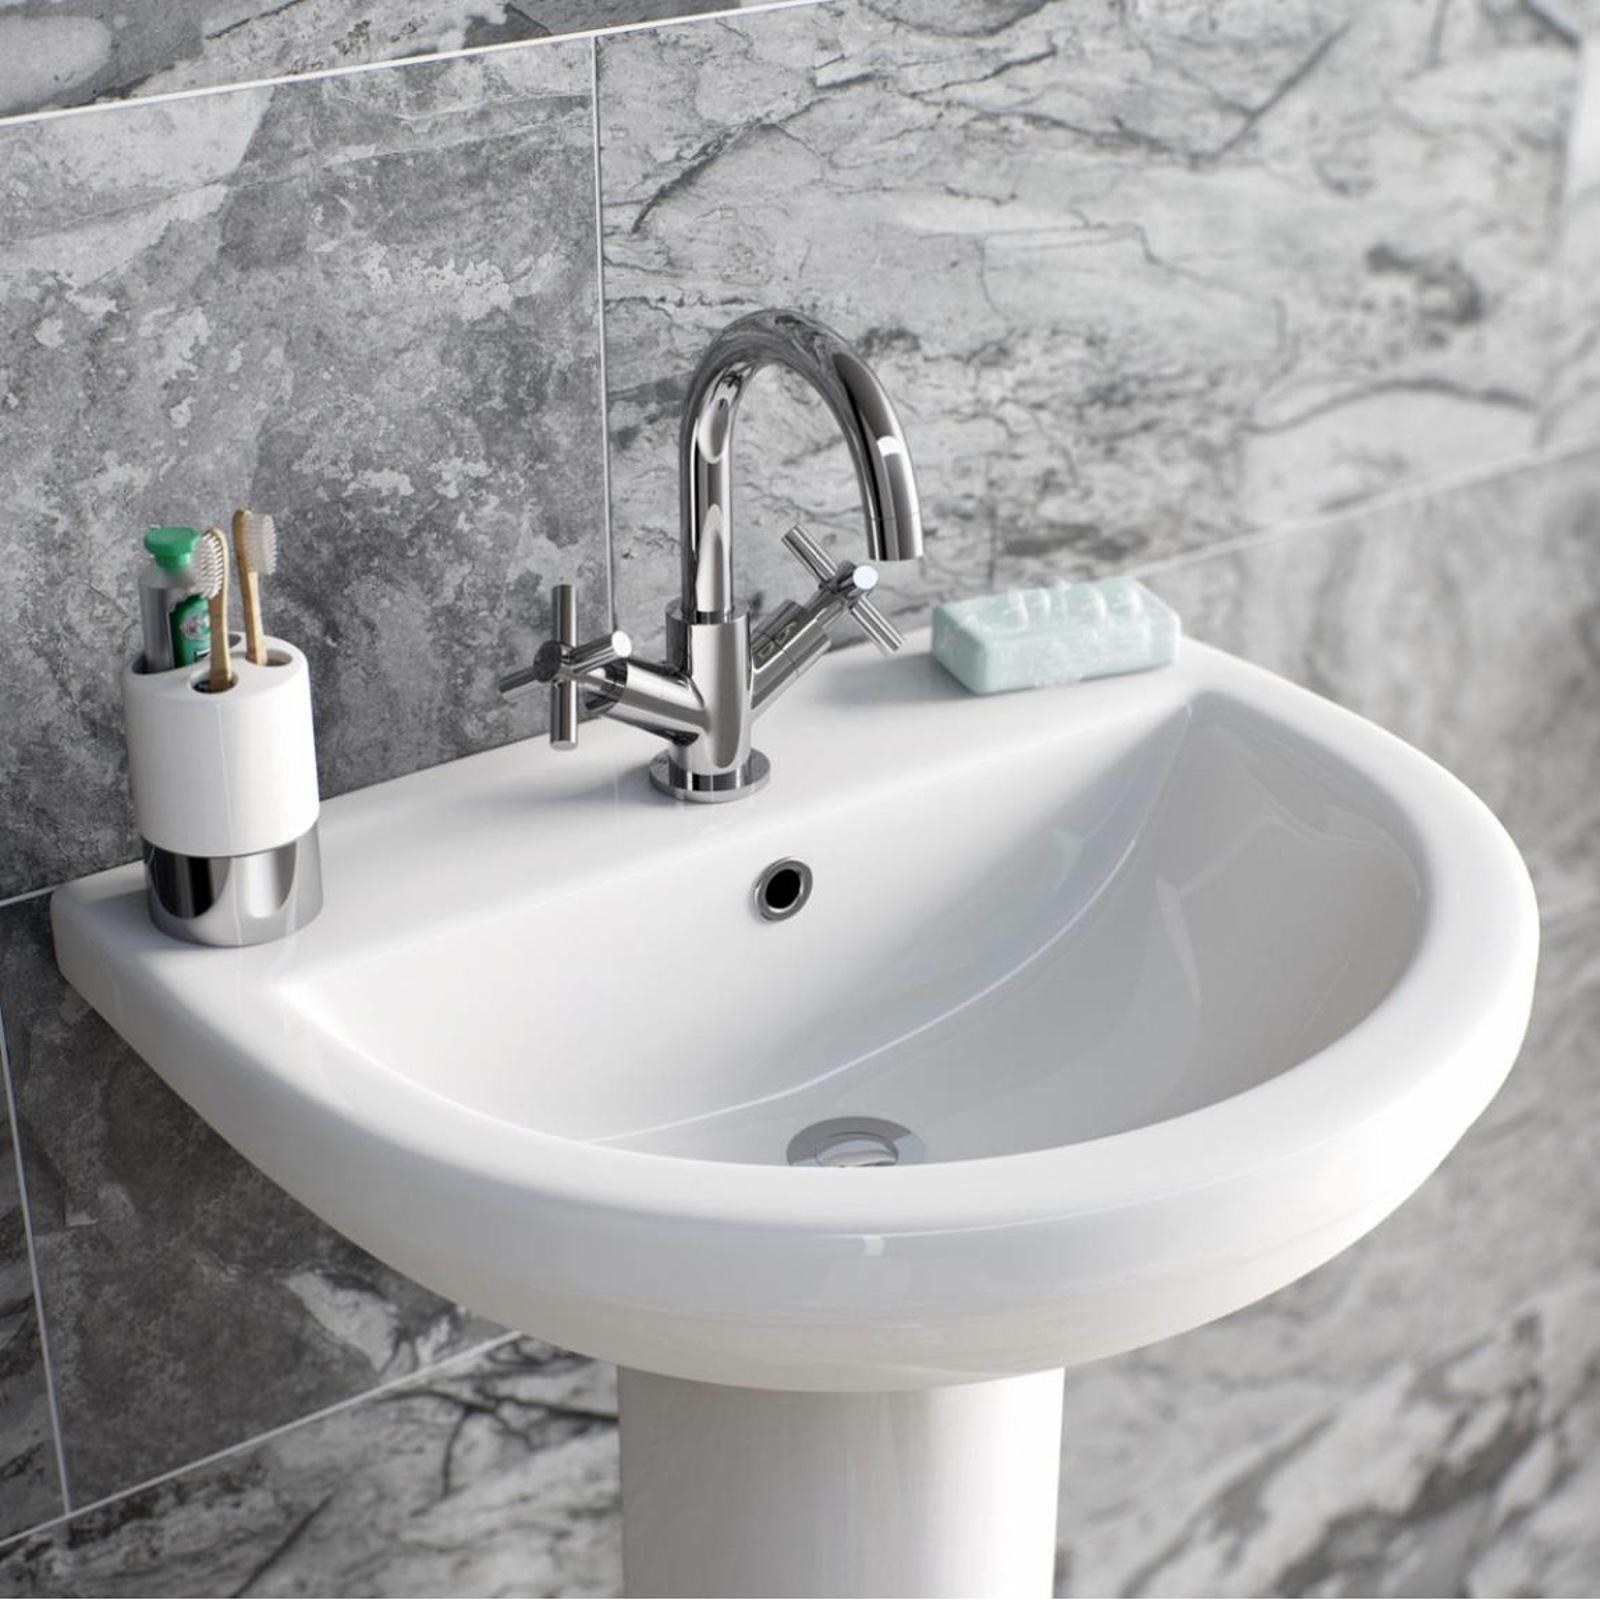 Enki oxford designer r servoir bain douche mixeur lavabo for Acheter crucifix mural